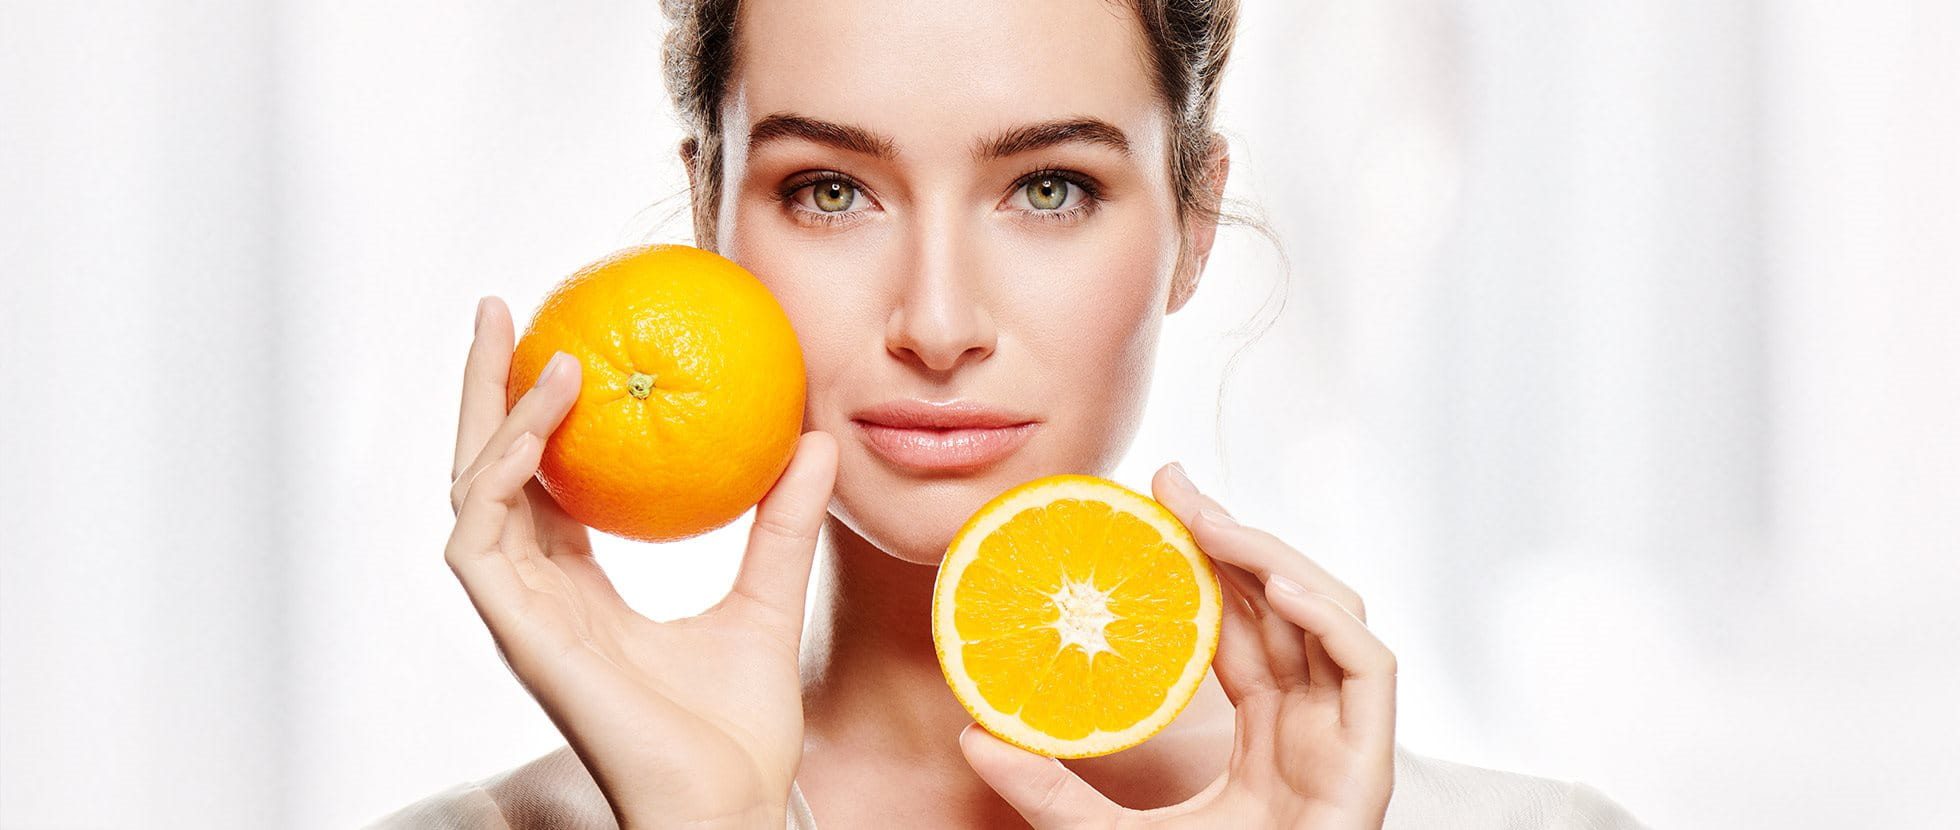 Vitamin C antioxidant for skin